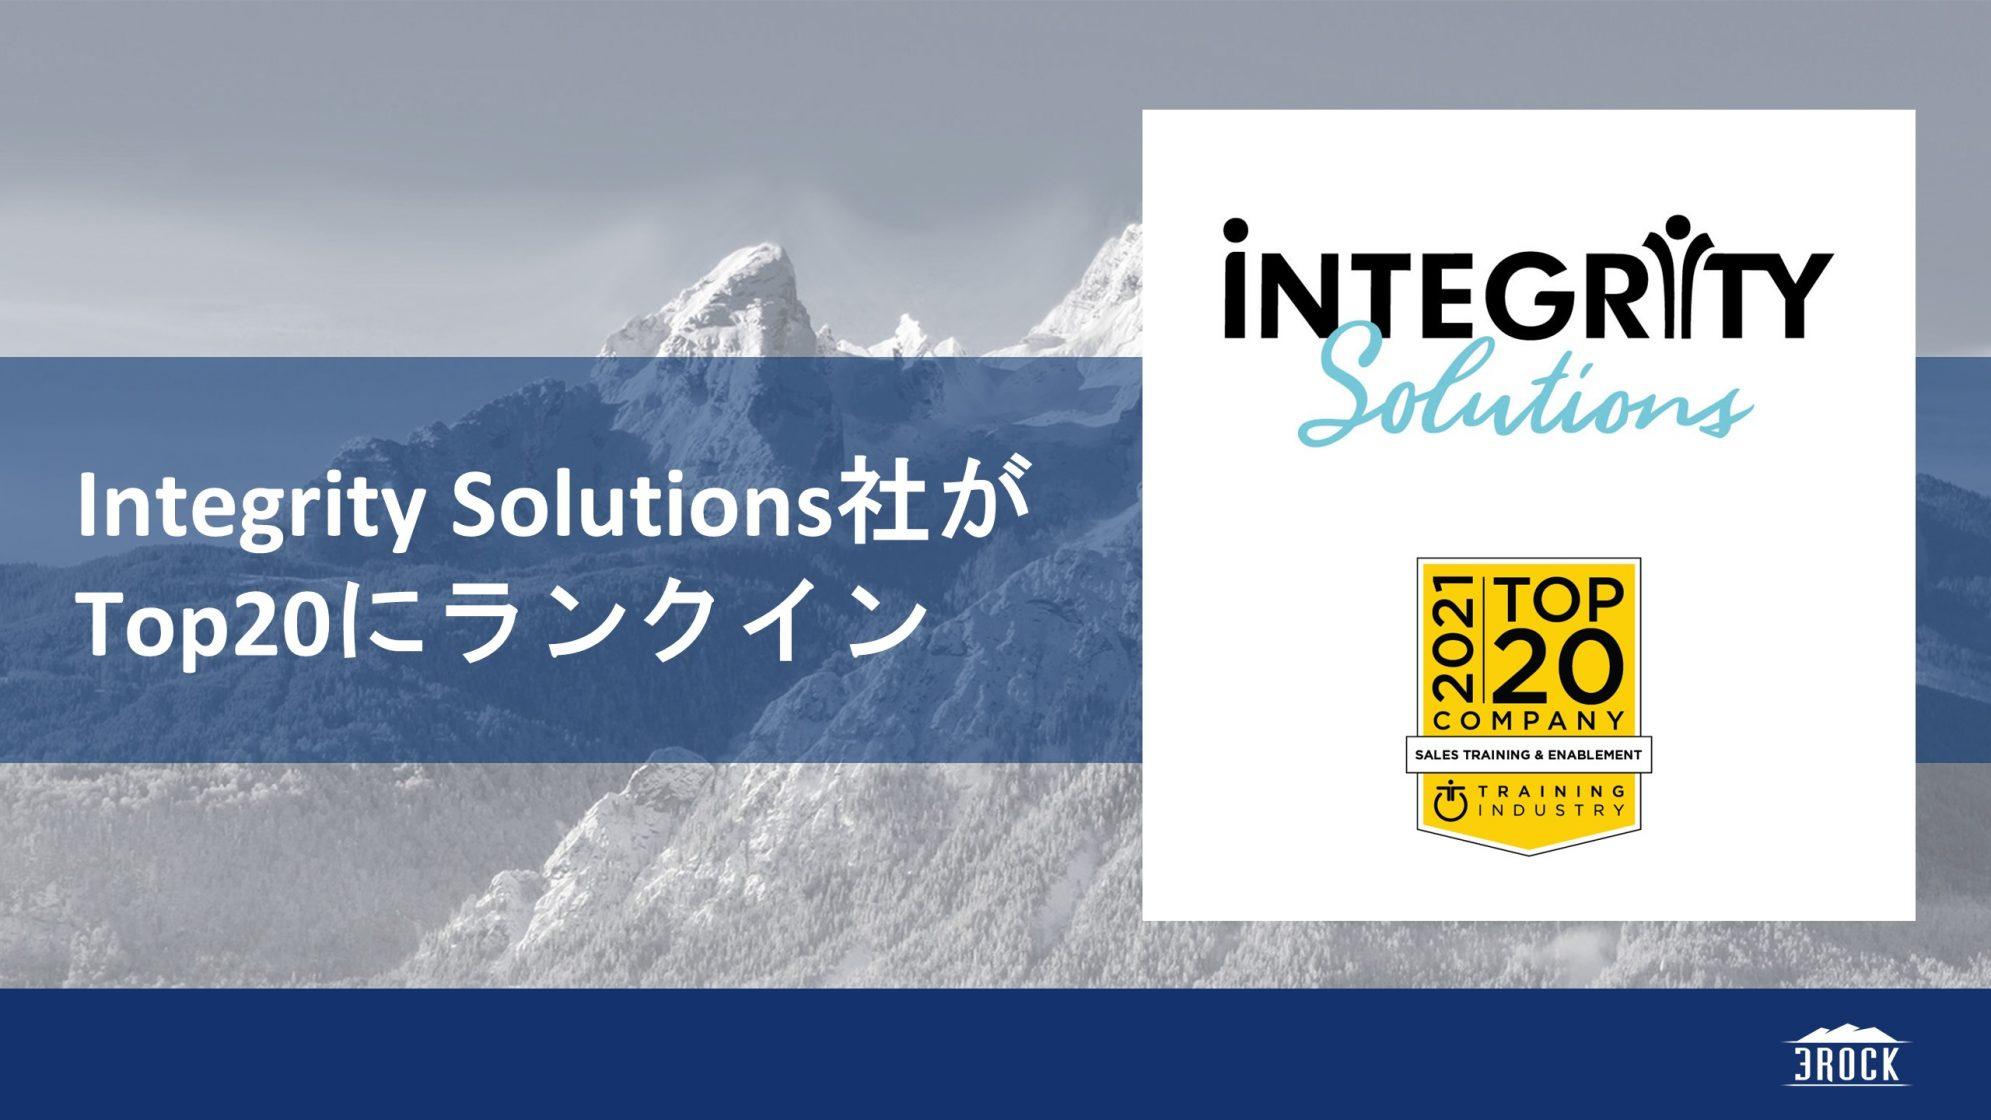 Integrity Solutions社が4年連続でTop20にランクイン